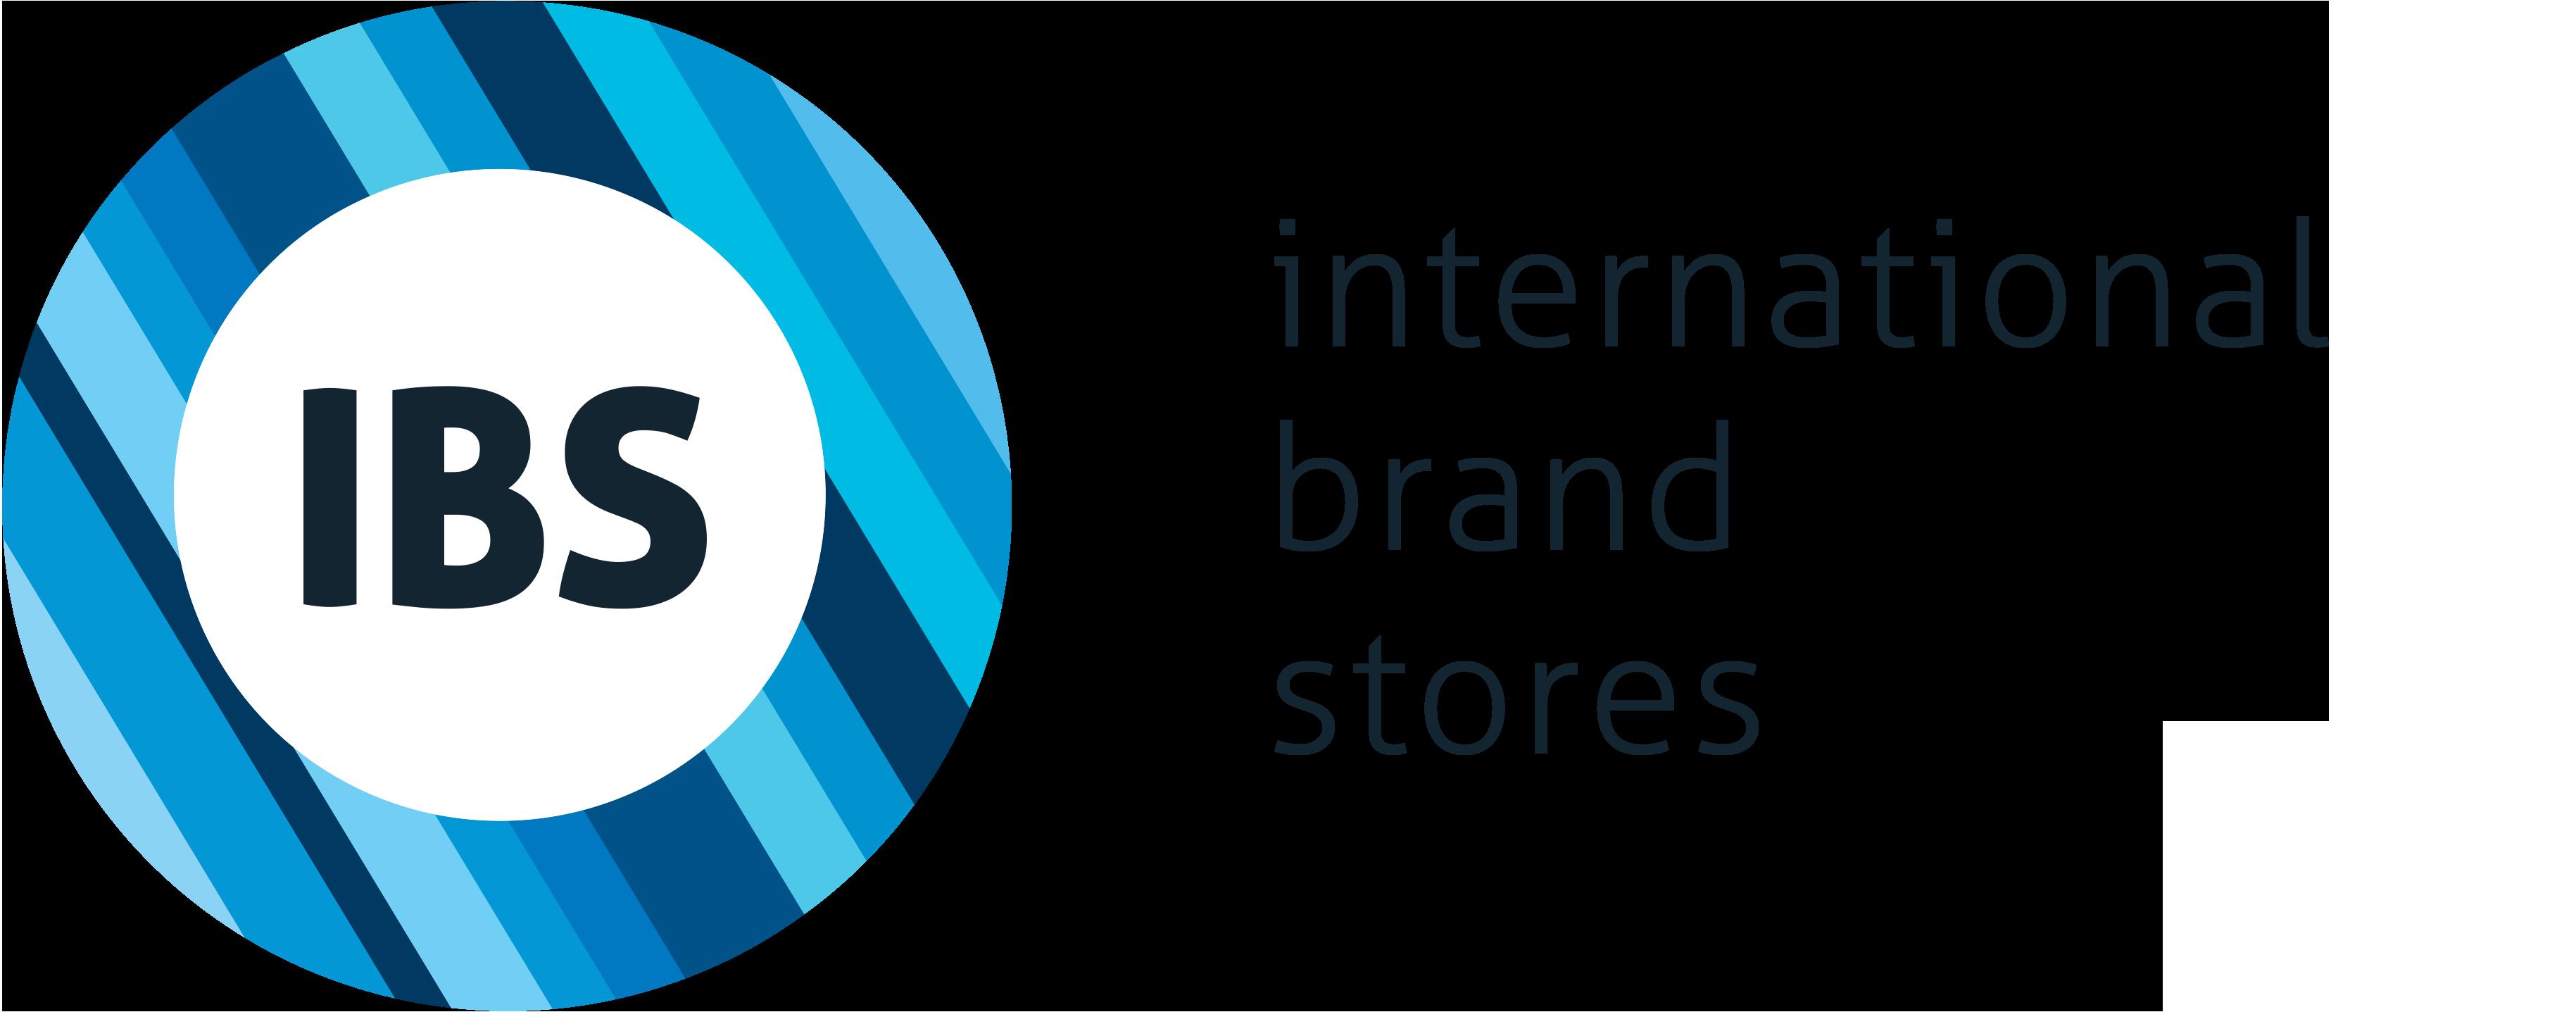 International Brand Stores